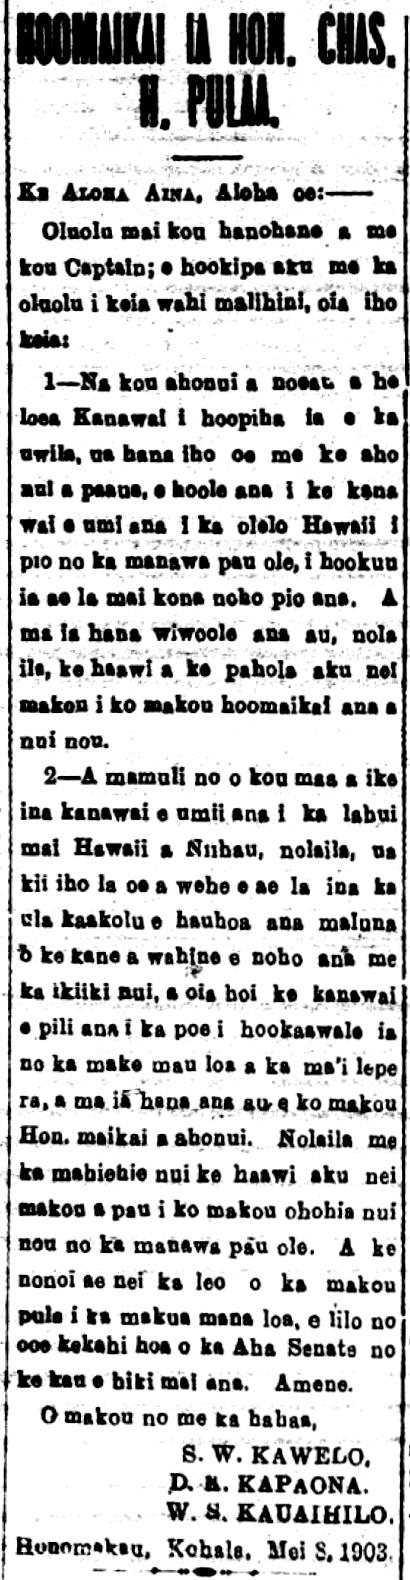 AlohaAina_5_23_1903_6.png